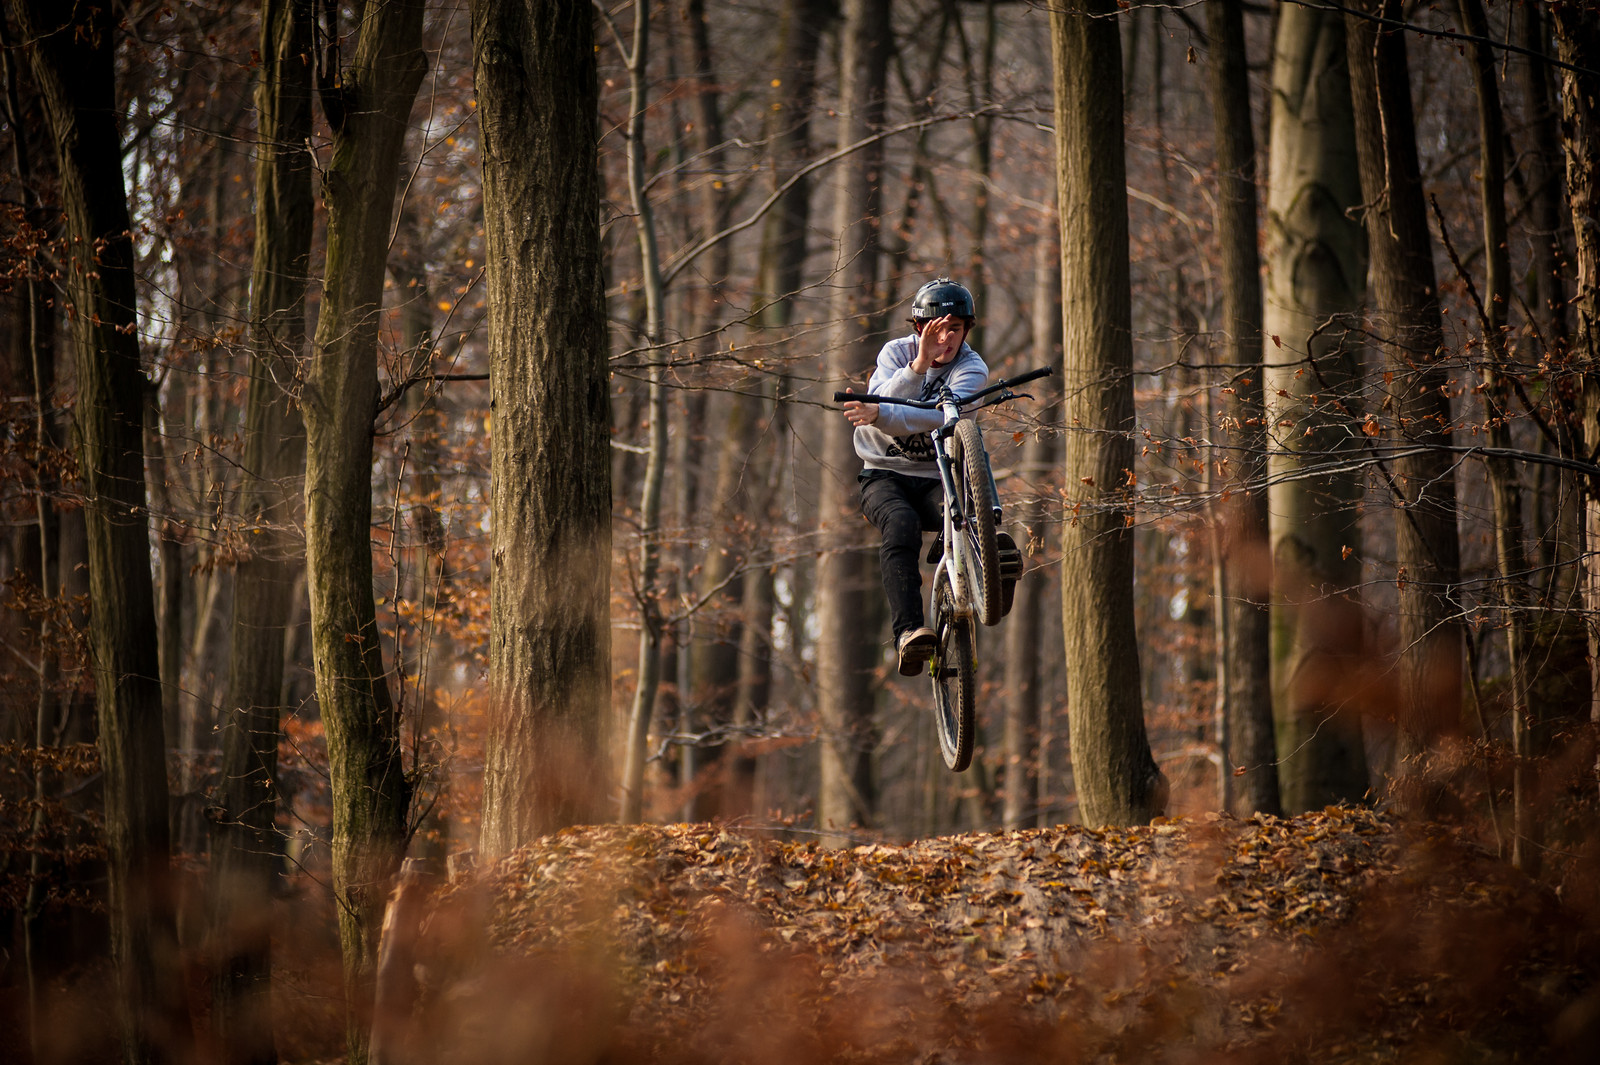 girb - purehell - Mountain Biking Pictures - Vital MTB